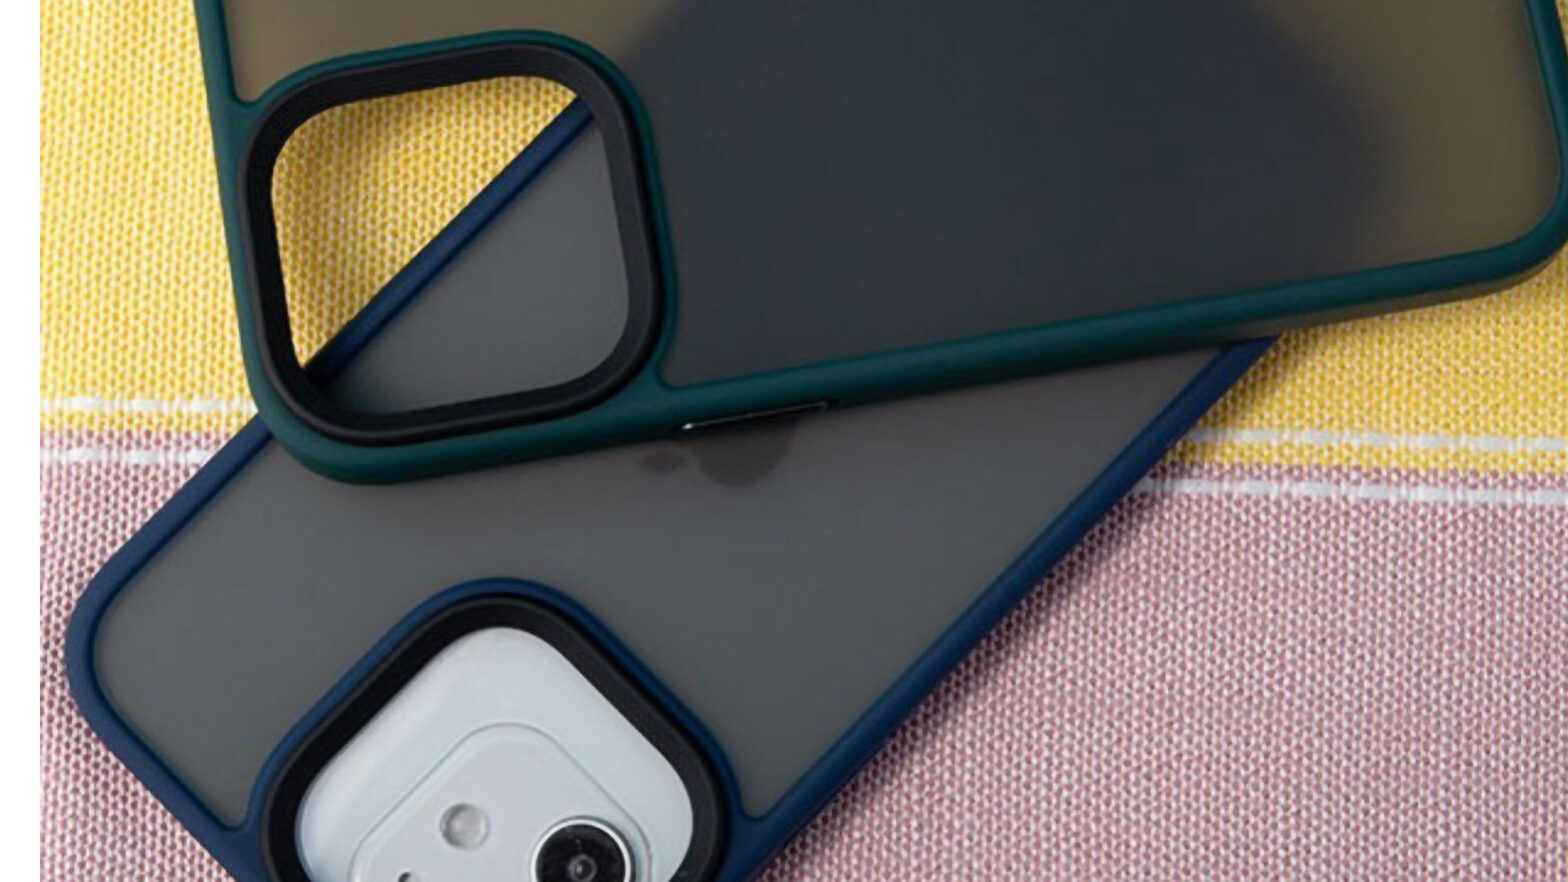 Apple iPhone 13 Phone Cases